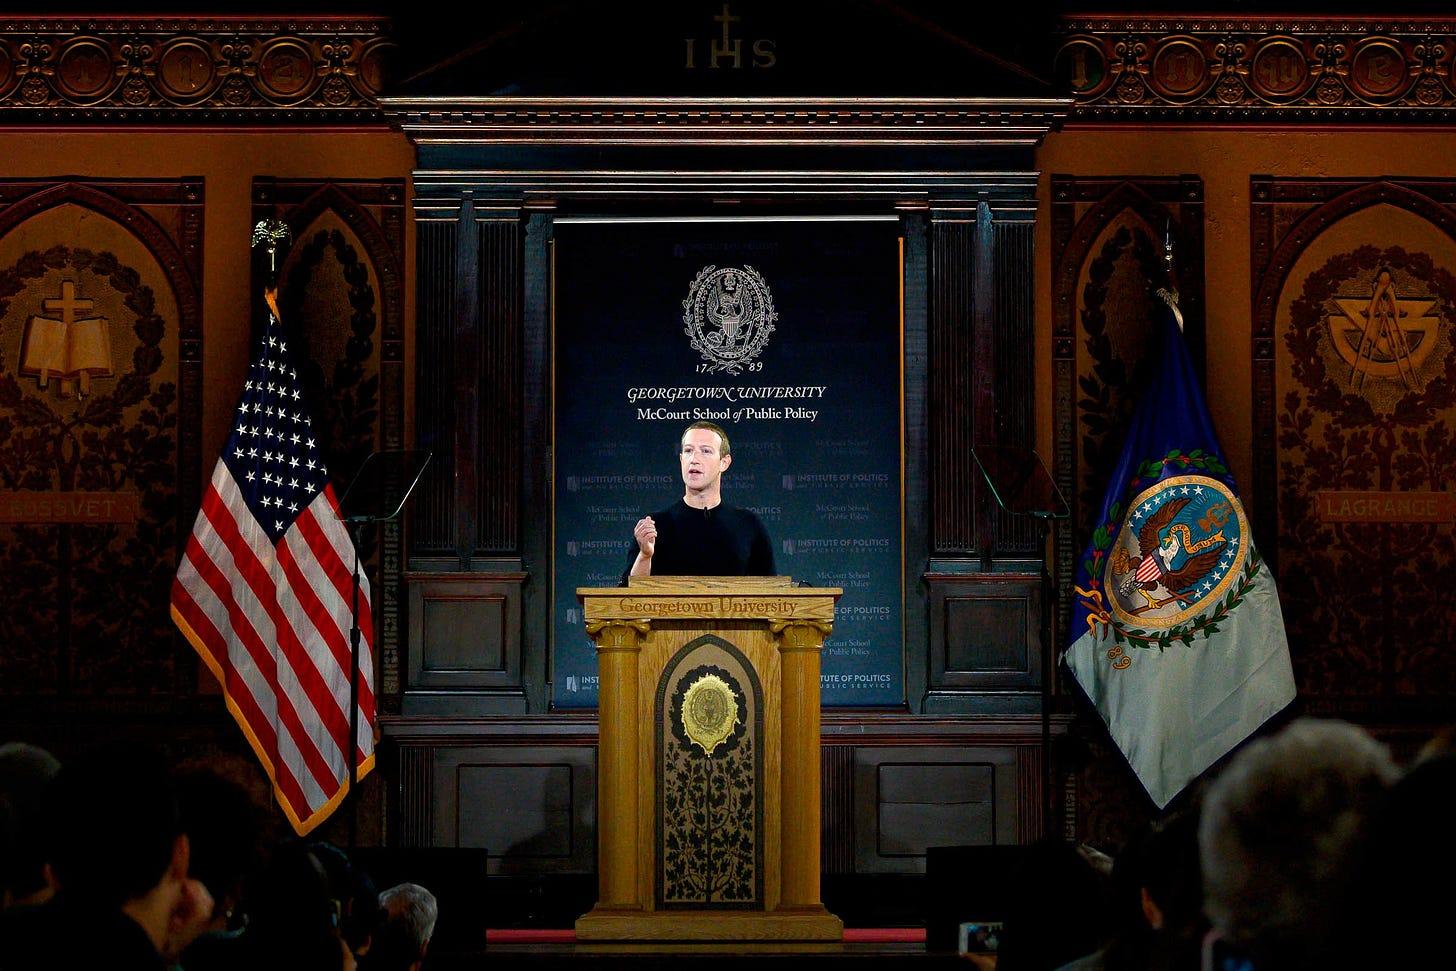 Mark Zuckerberg speaks at a podium at Georgetown University